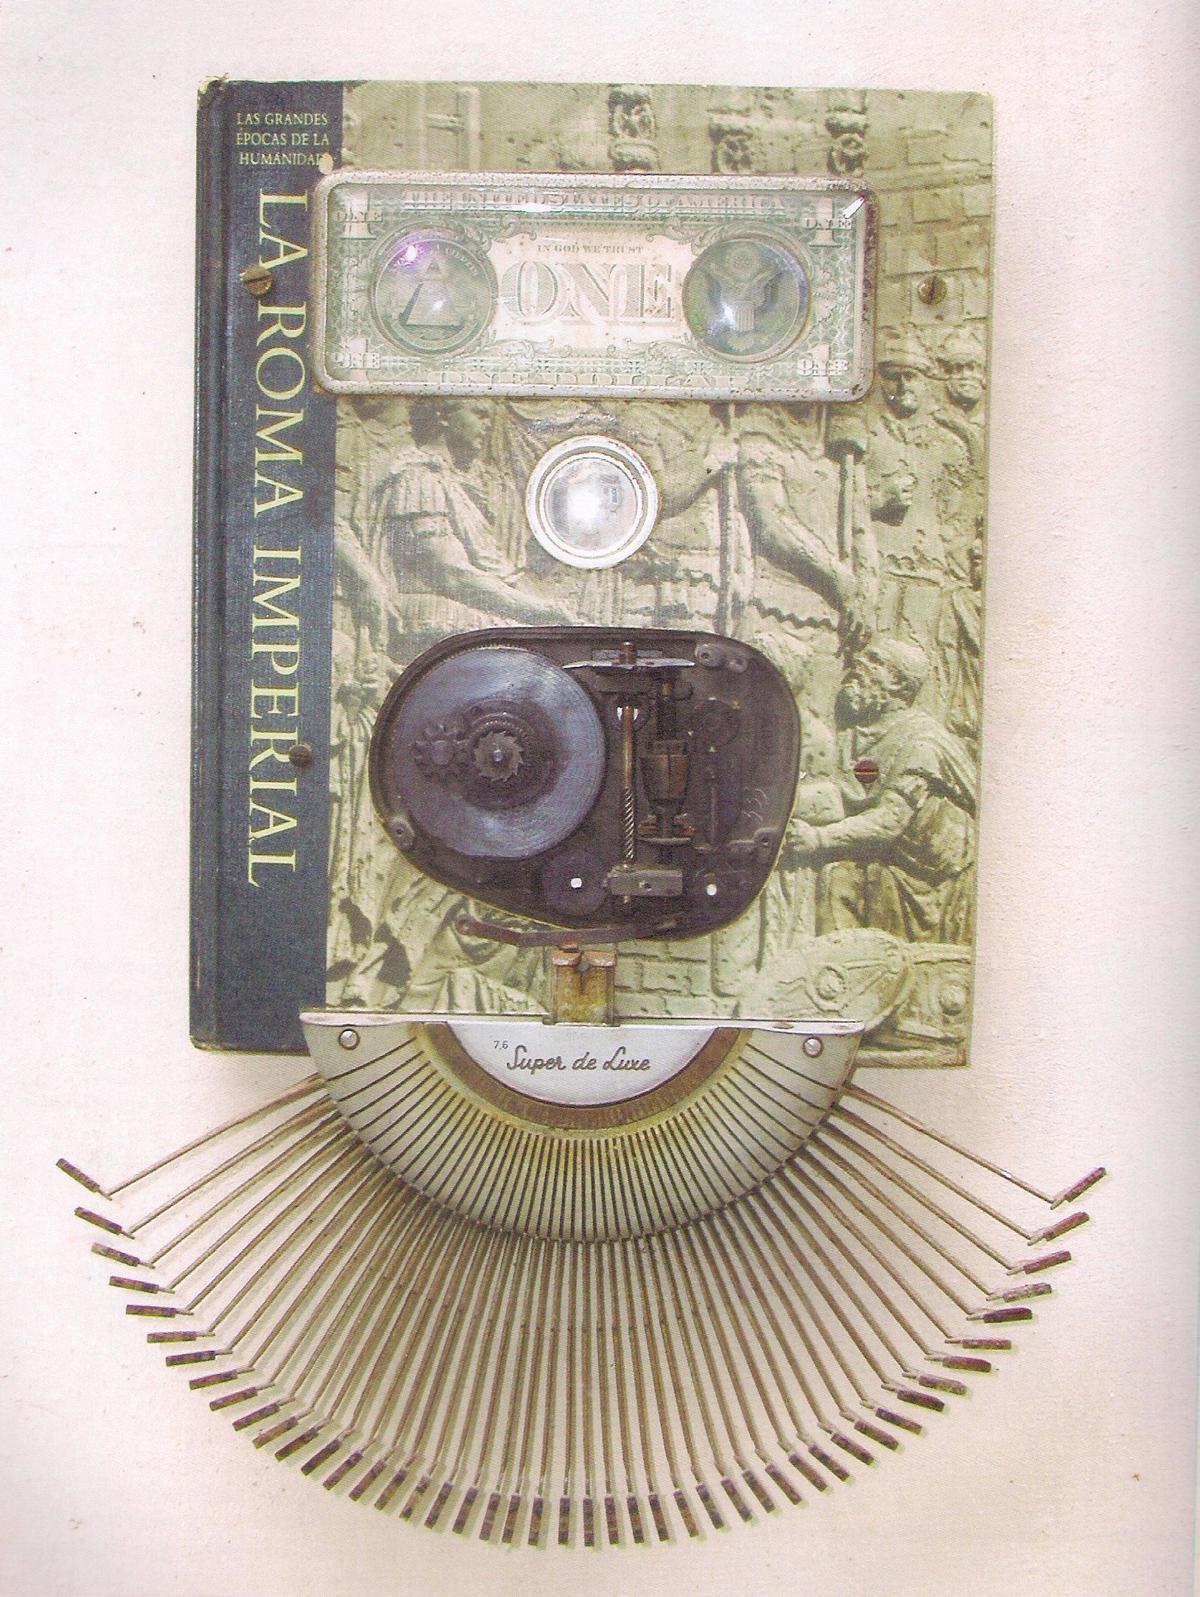 Eduardo Ponjuán. La Roma imperial. 1998. De la serie Time Life. Instalación. 41 x 29 x 4.5 cm.